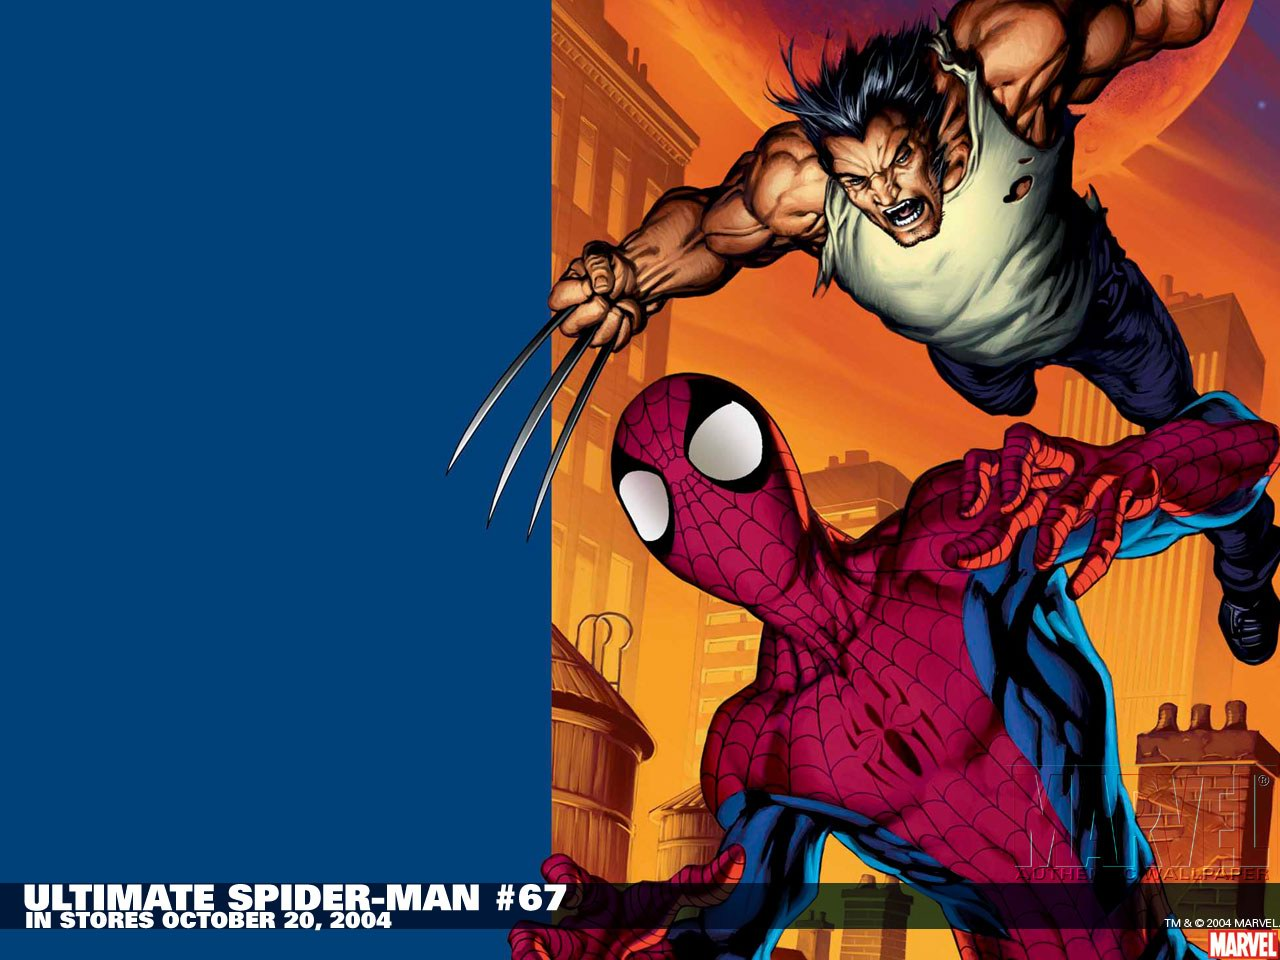 Marvel hd wallpaper techmynd 57 500x375 100 Marvel Super Heroes HD 1280x960